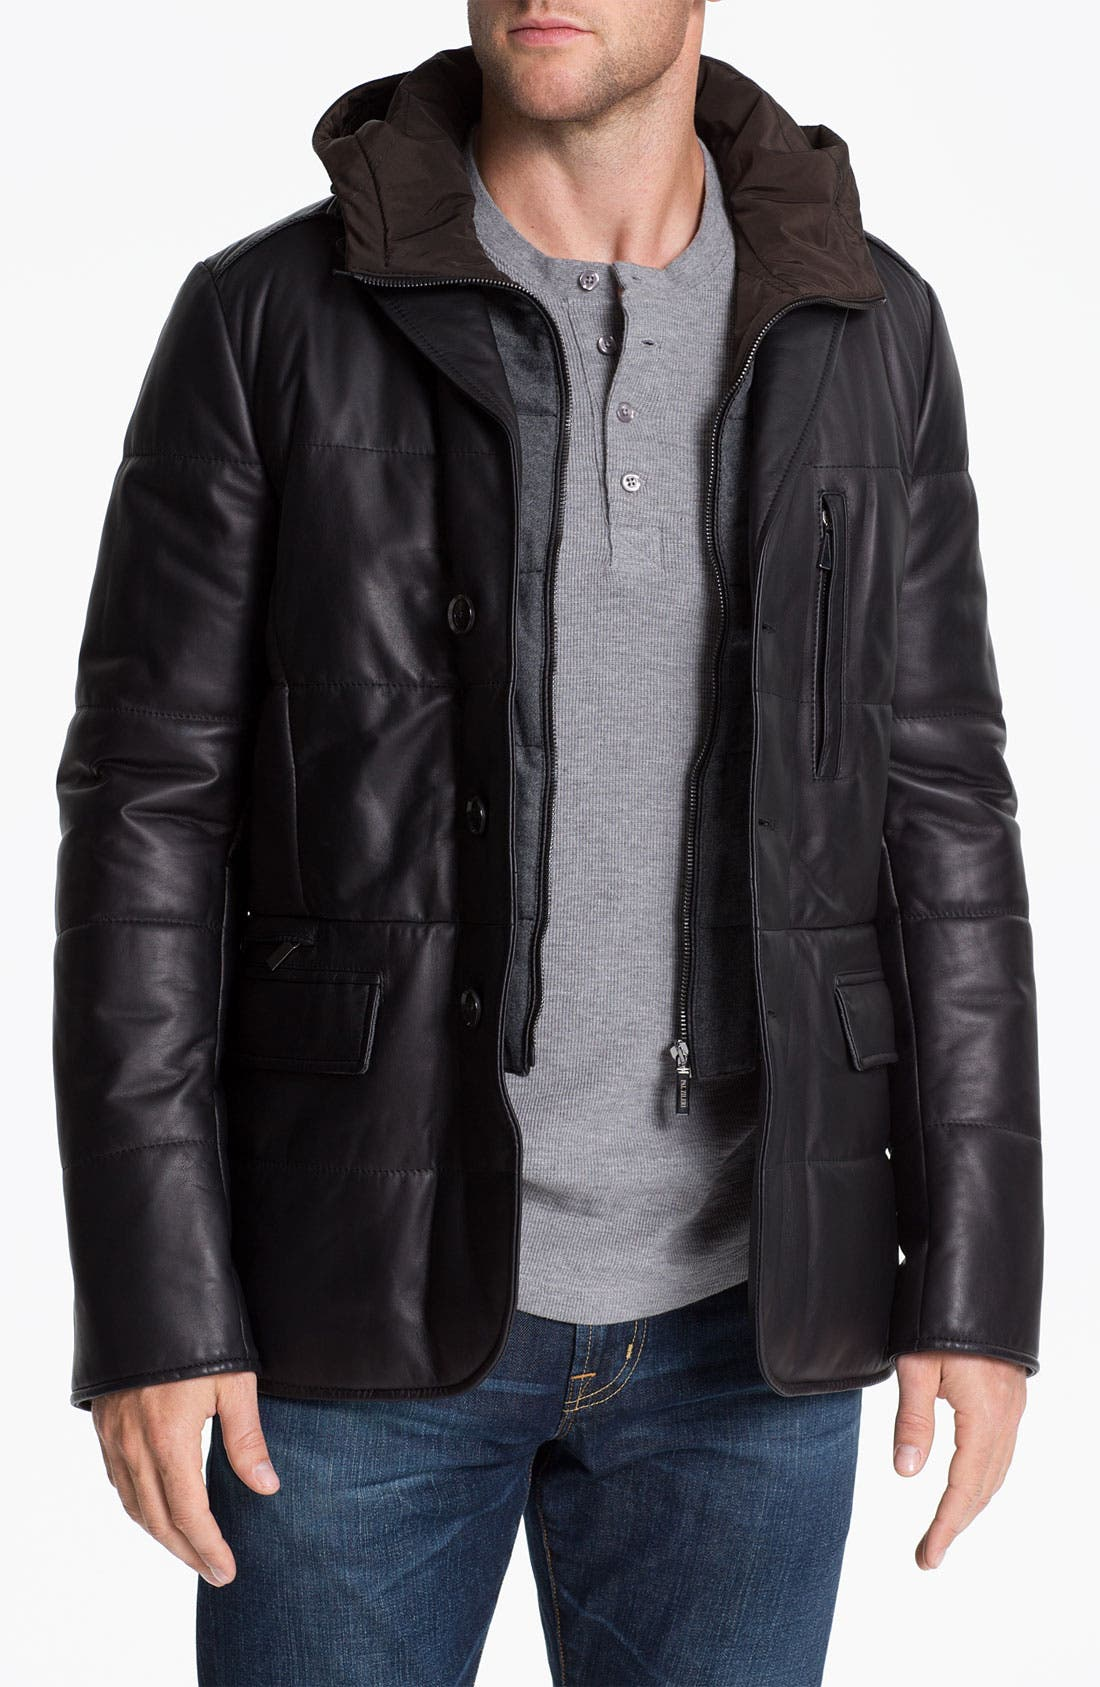 Alternate Image 1 Selected - Pal Zileri 'Napa' Hooded Leather Jacket